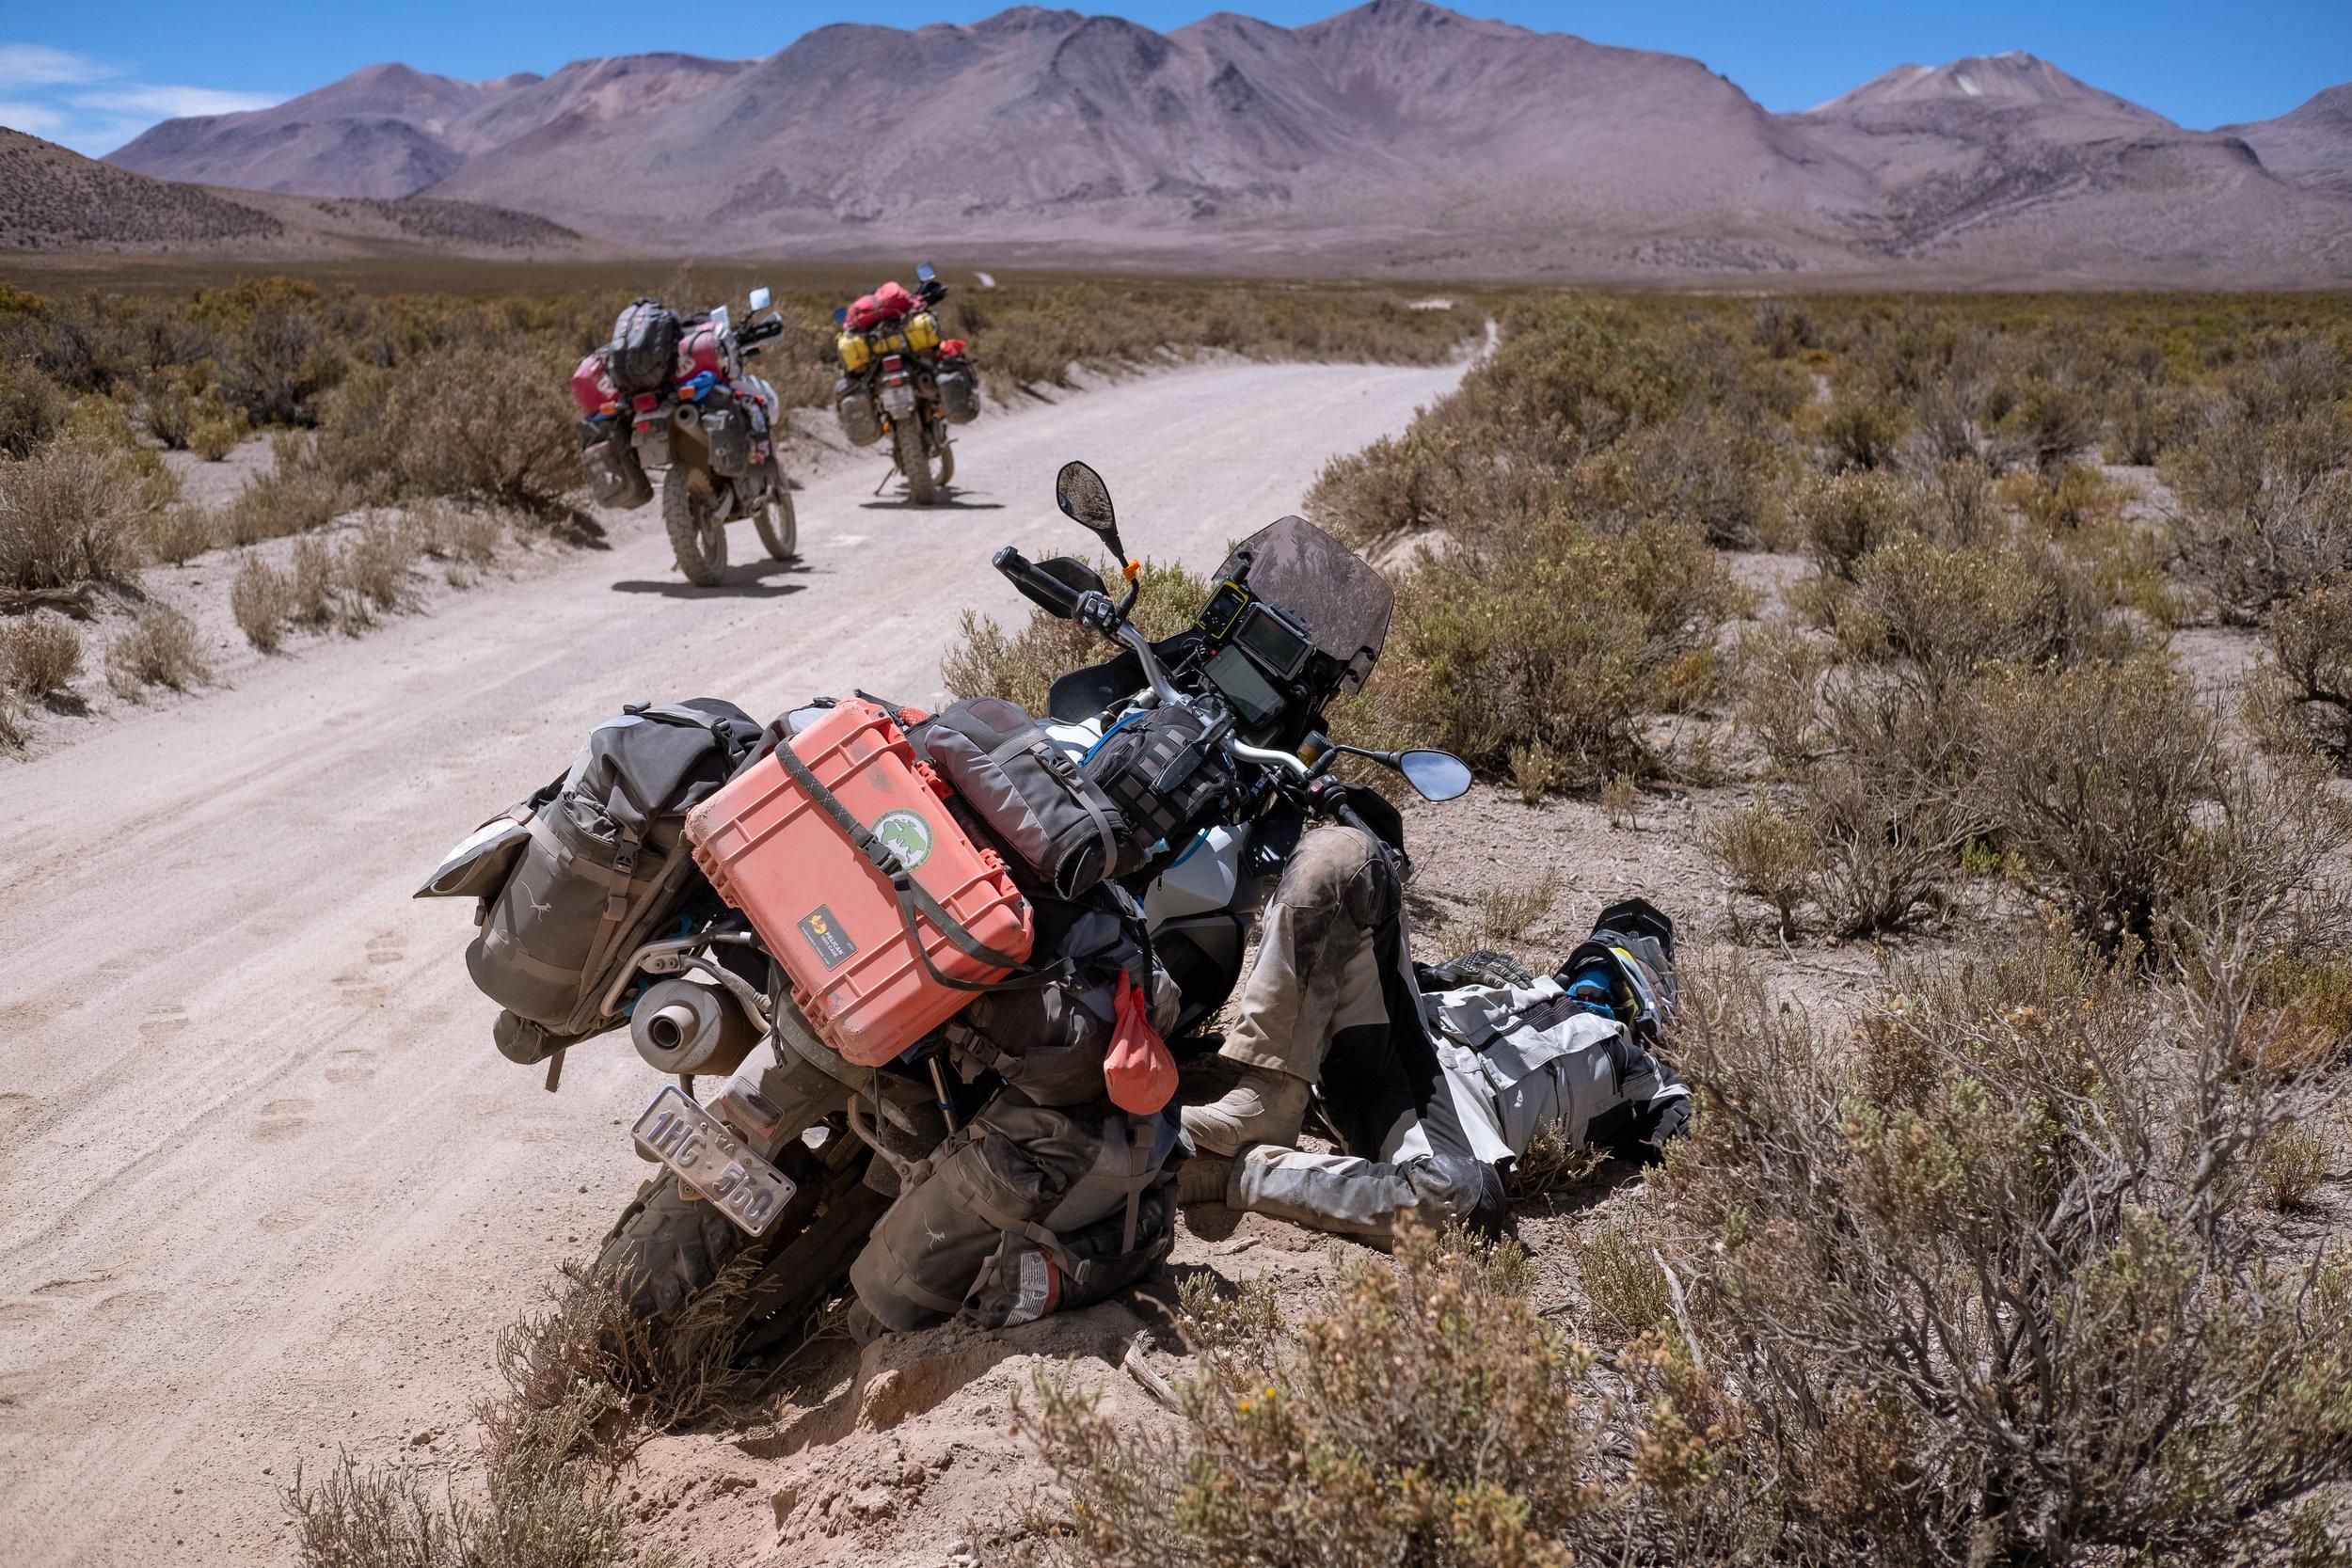 Paul-Neake-Hannaby-Adventure-Rider-Radio-Motorcycle-Podcast-2.jpg